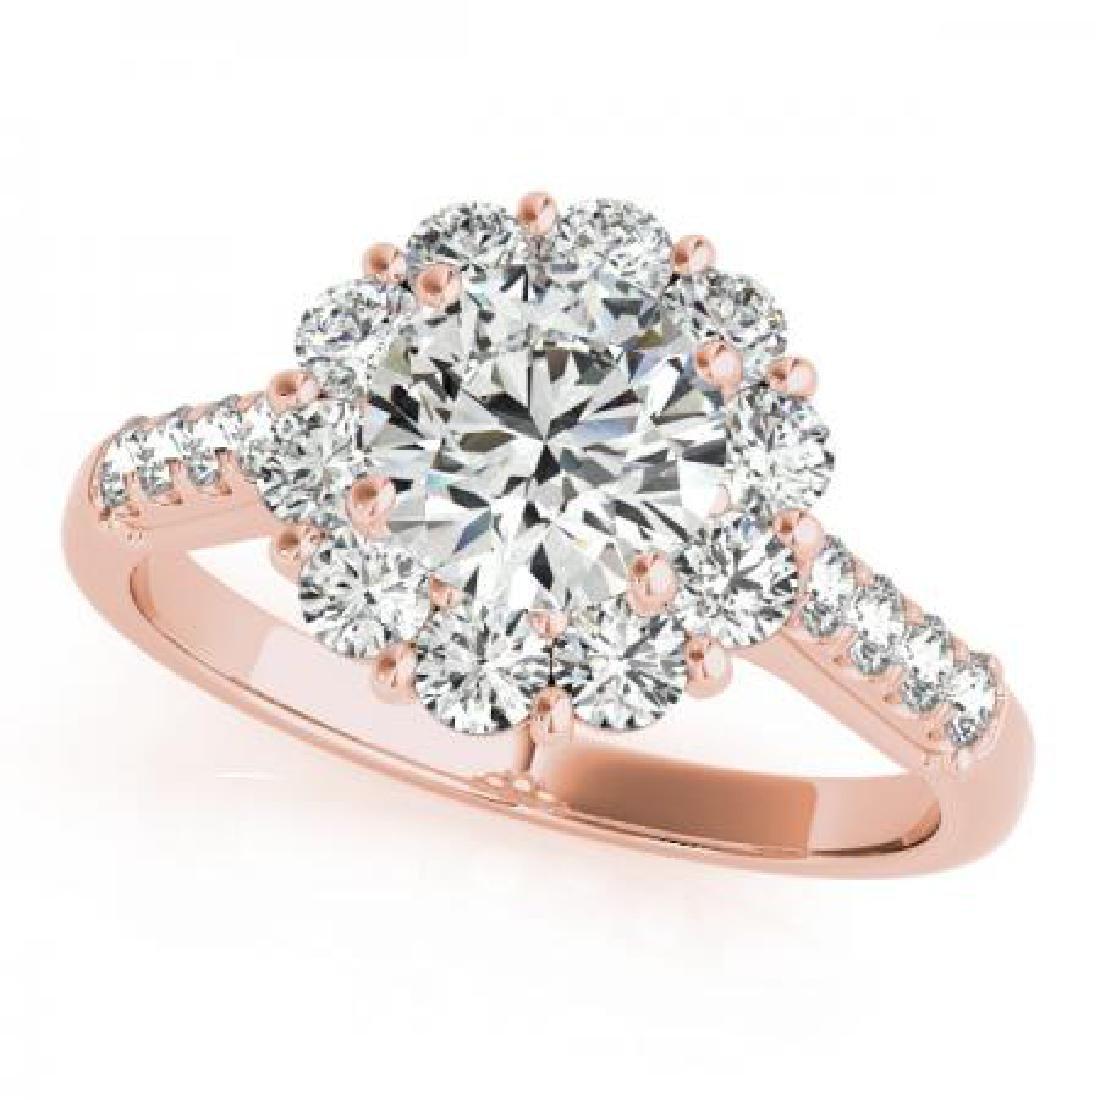 CERTIFIED 18K ROSE GOLD 2.12 CT G-H/VS-SI1 DIAMOND HALO